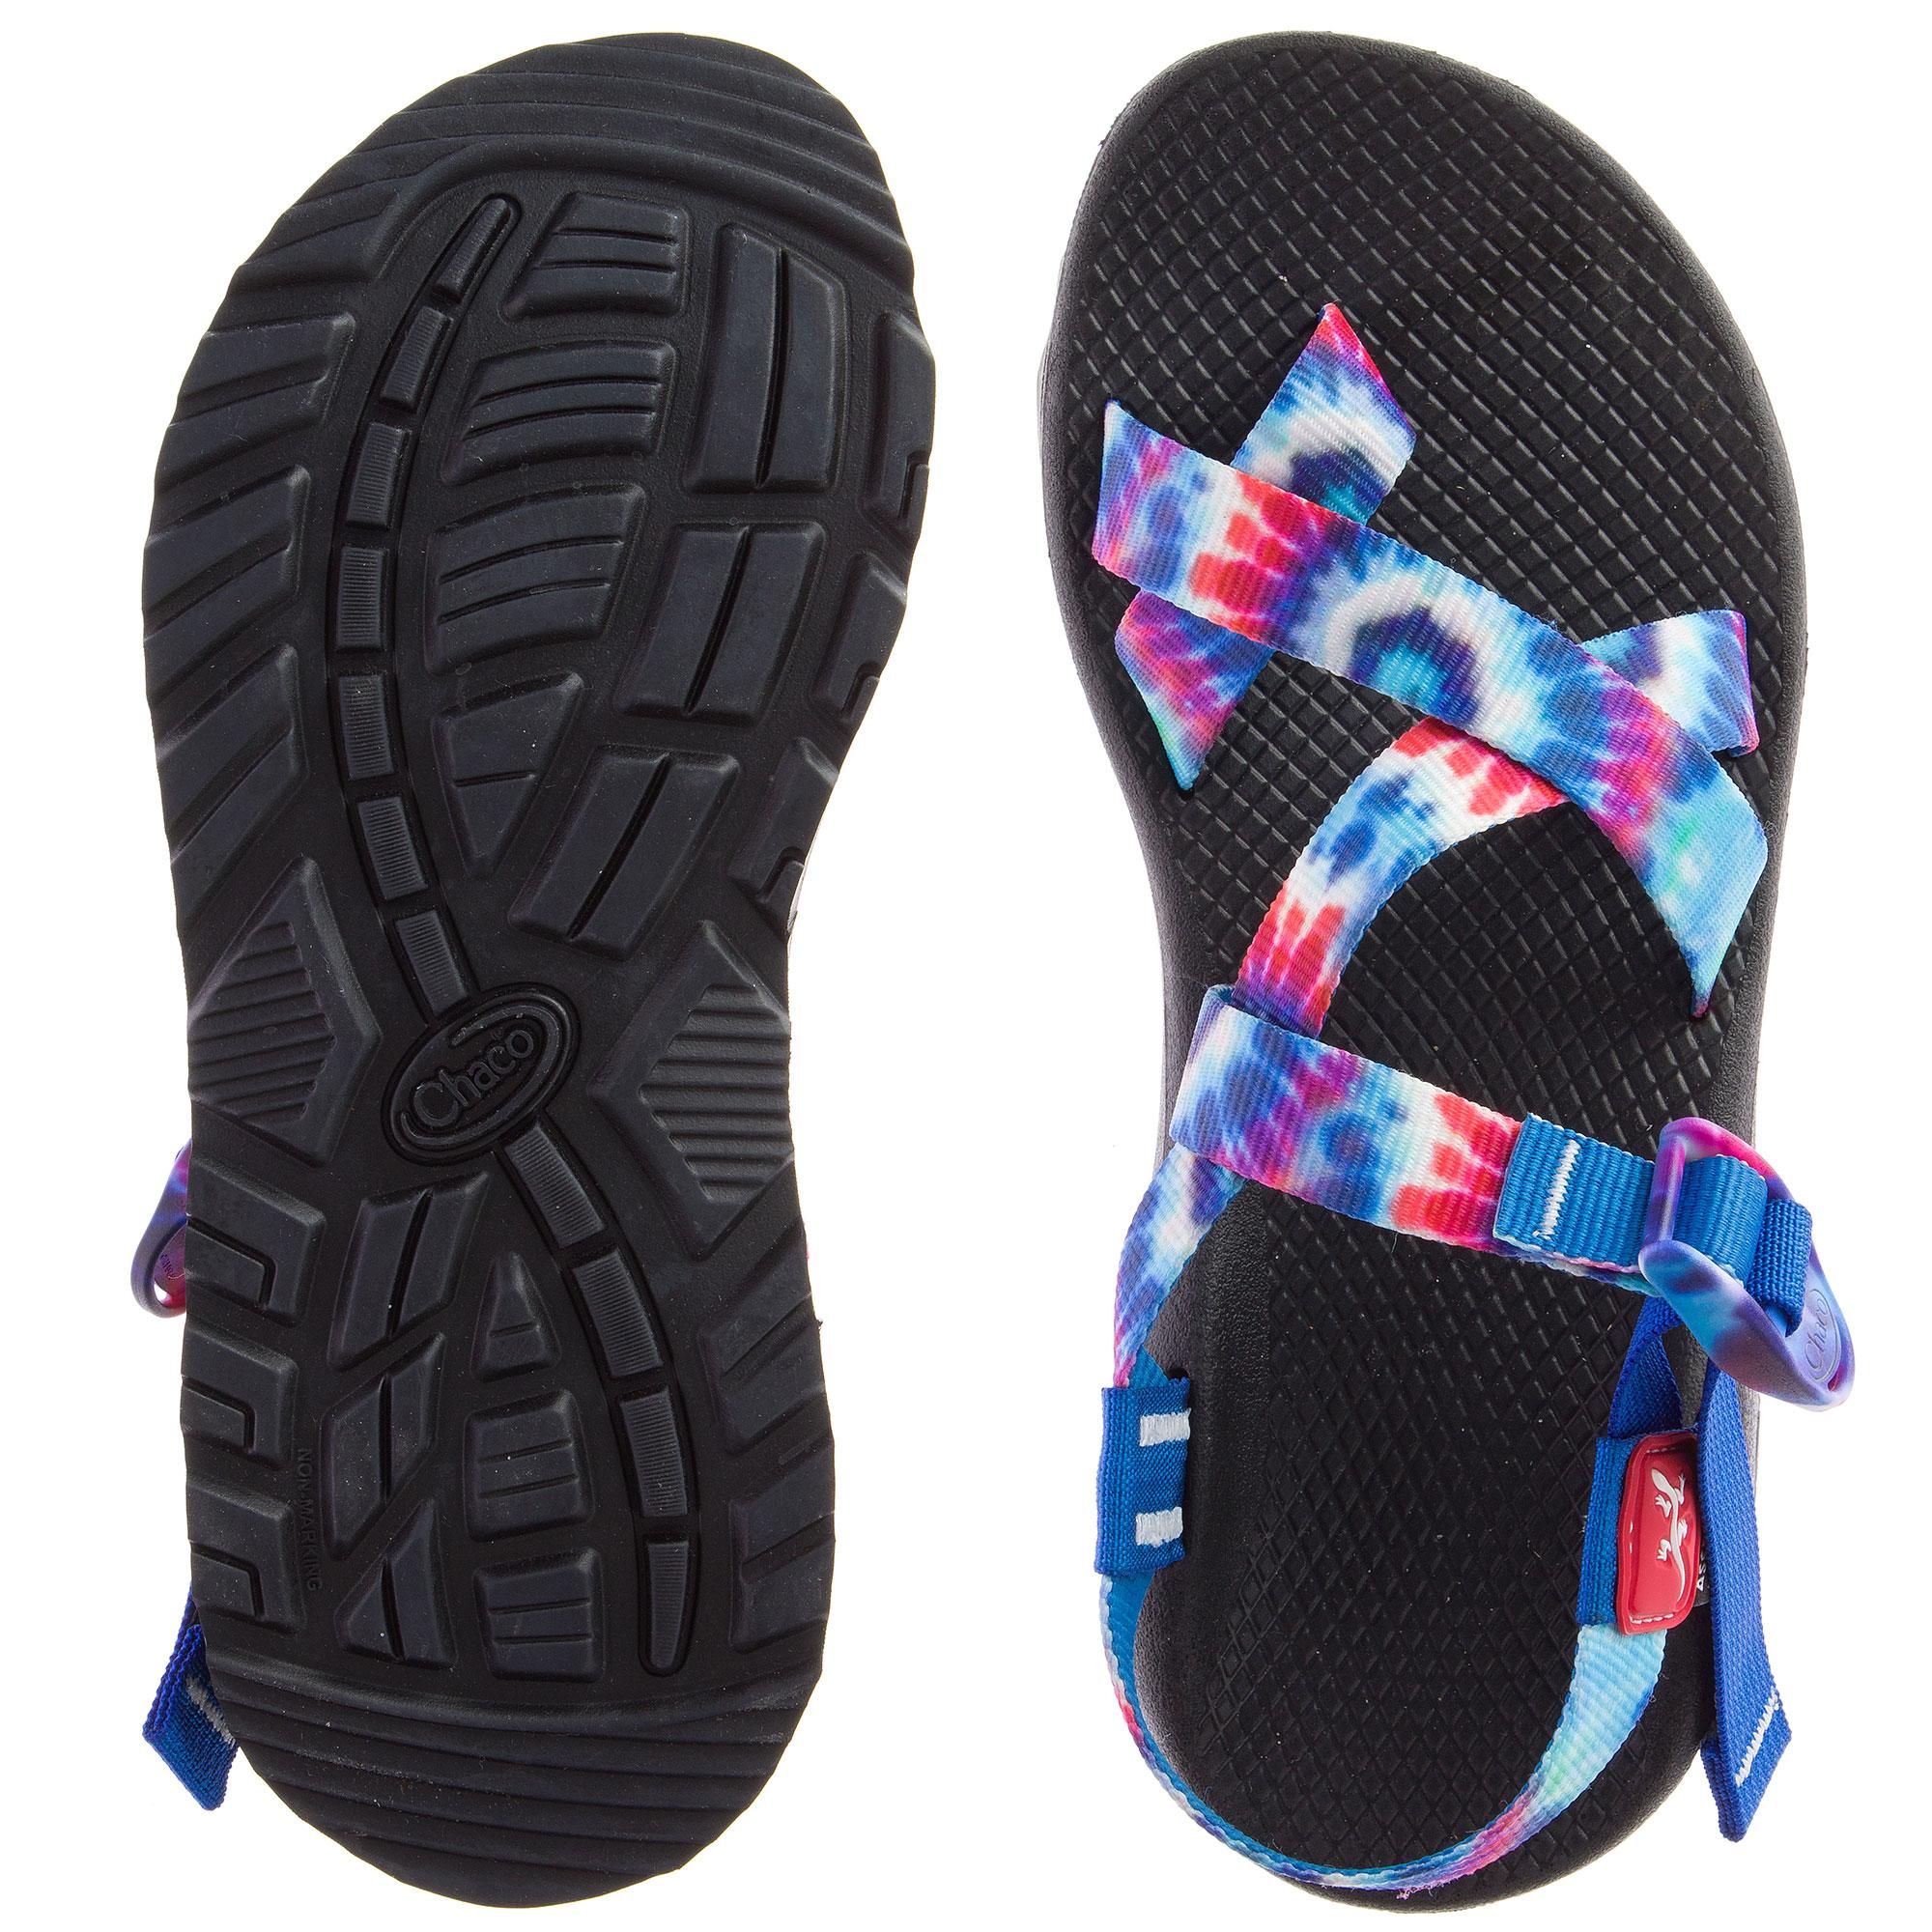 60ab341b68 Chaco Women's Z/2 Classic RWB Tie Dye Sandals - Sun & Ski Sports